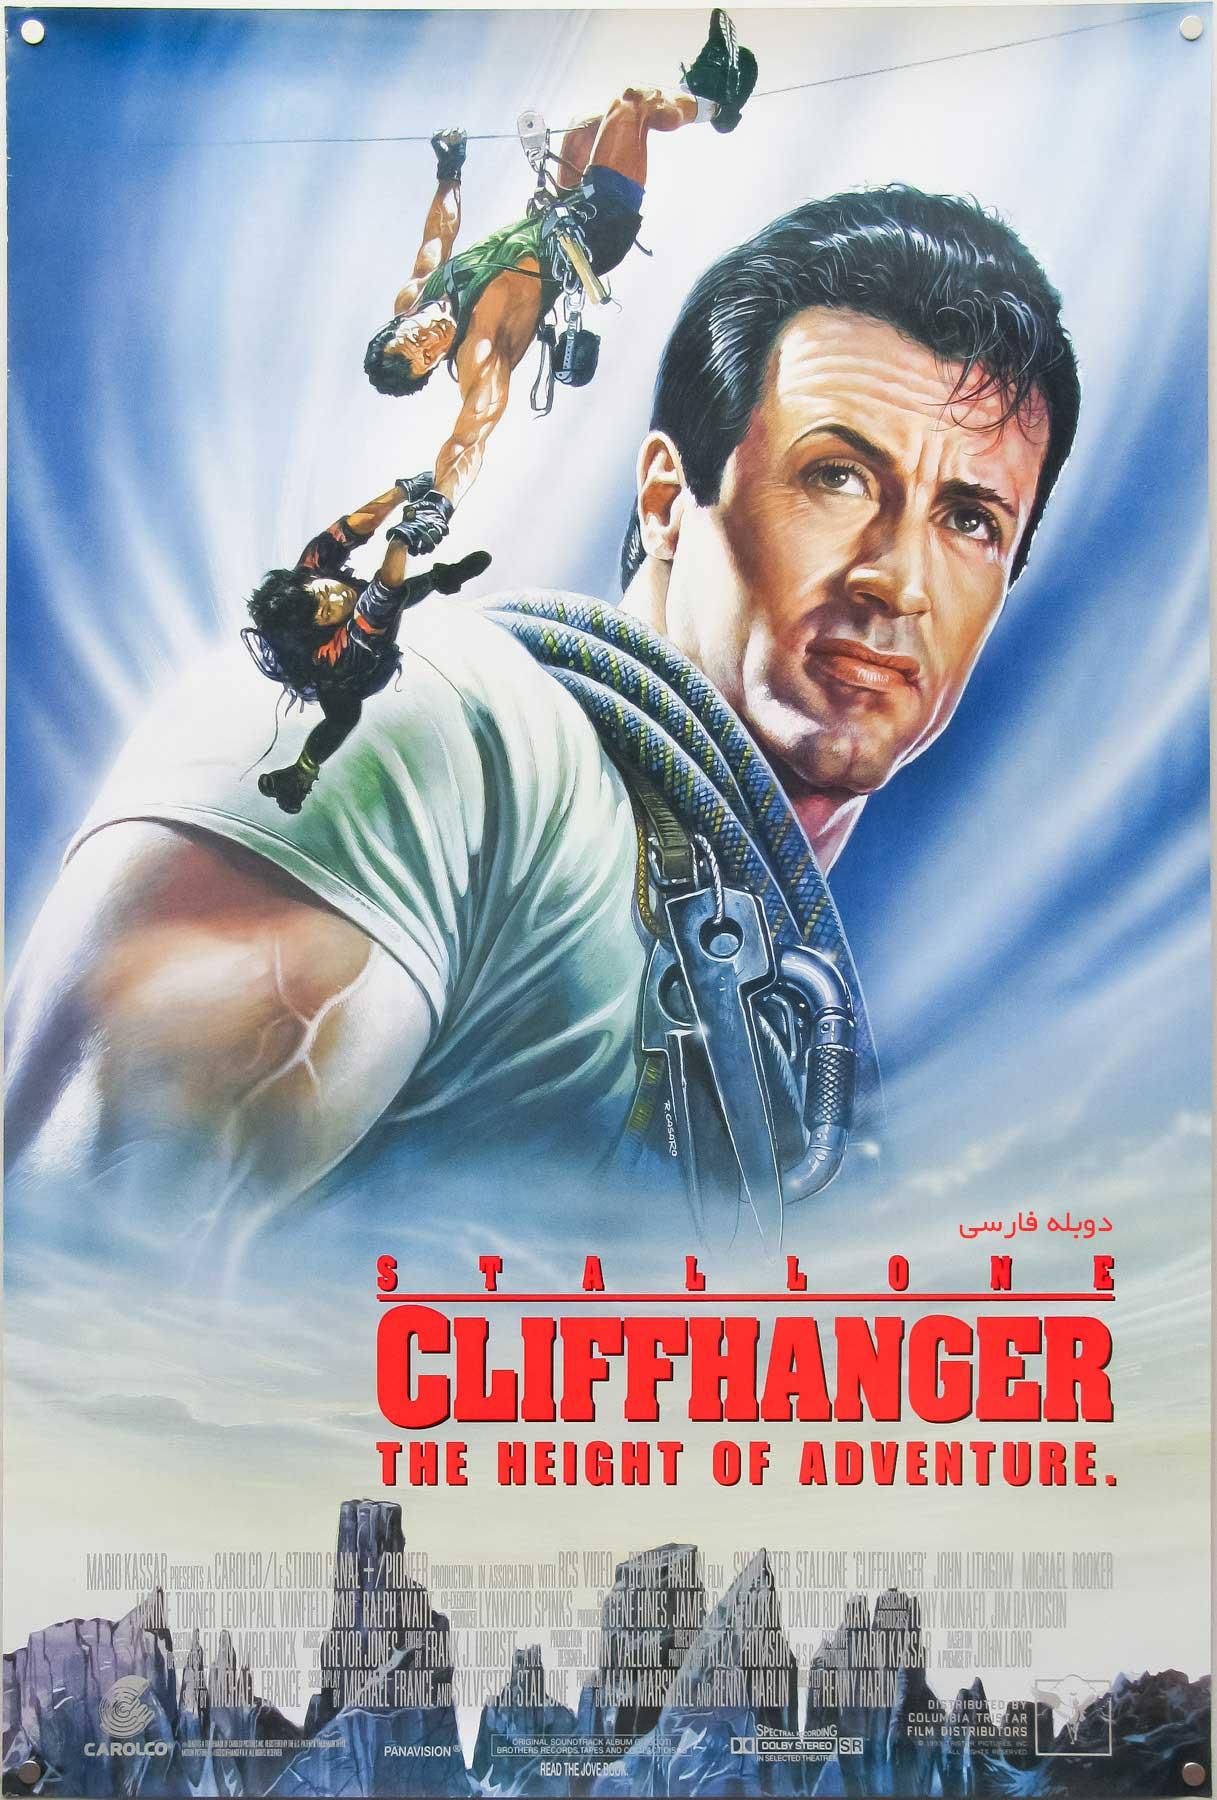 دانلود فیلم Cliffhanger صخره نورد - دانلود فیلم Cliffhanger صخره نورد دوبله فارسی